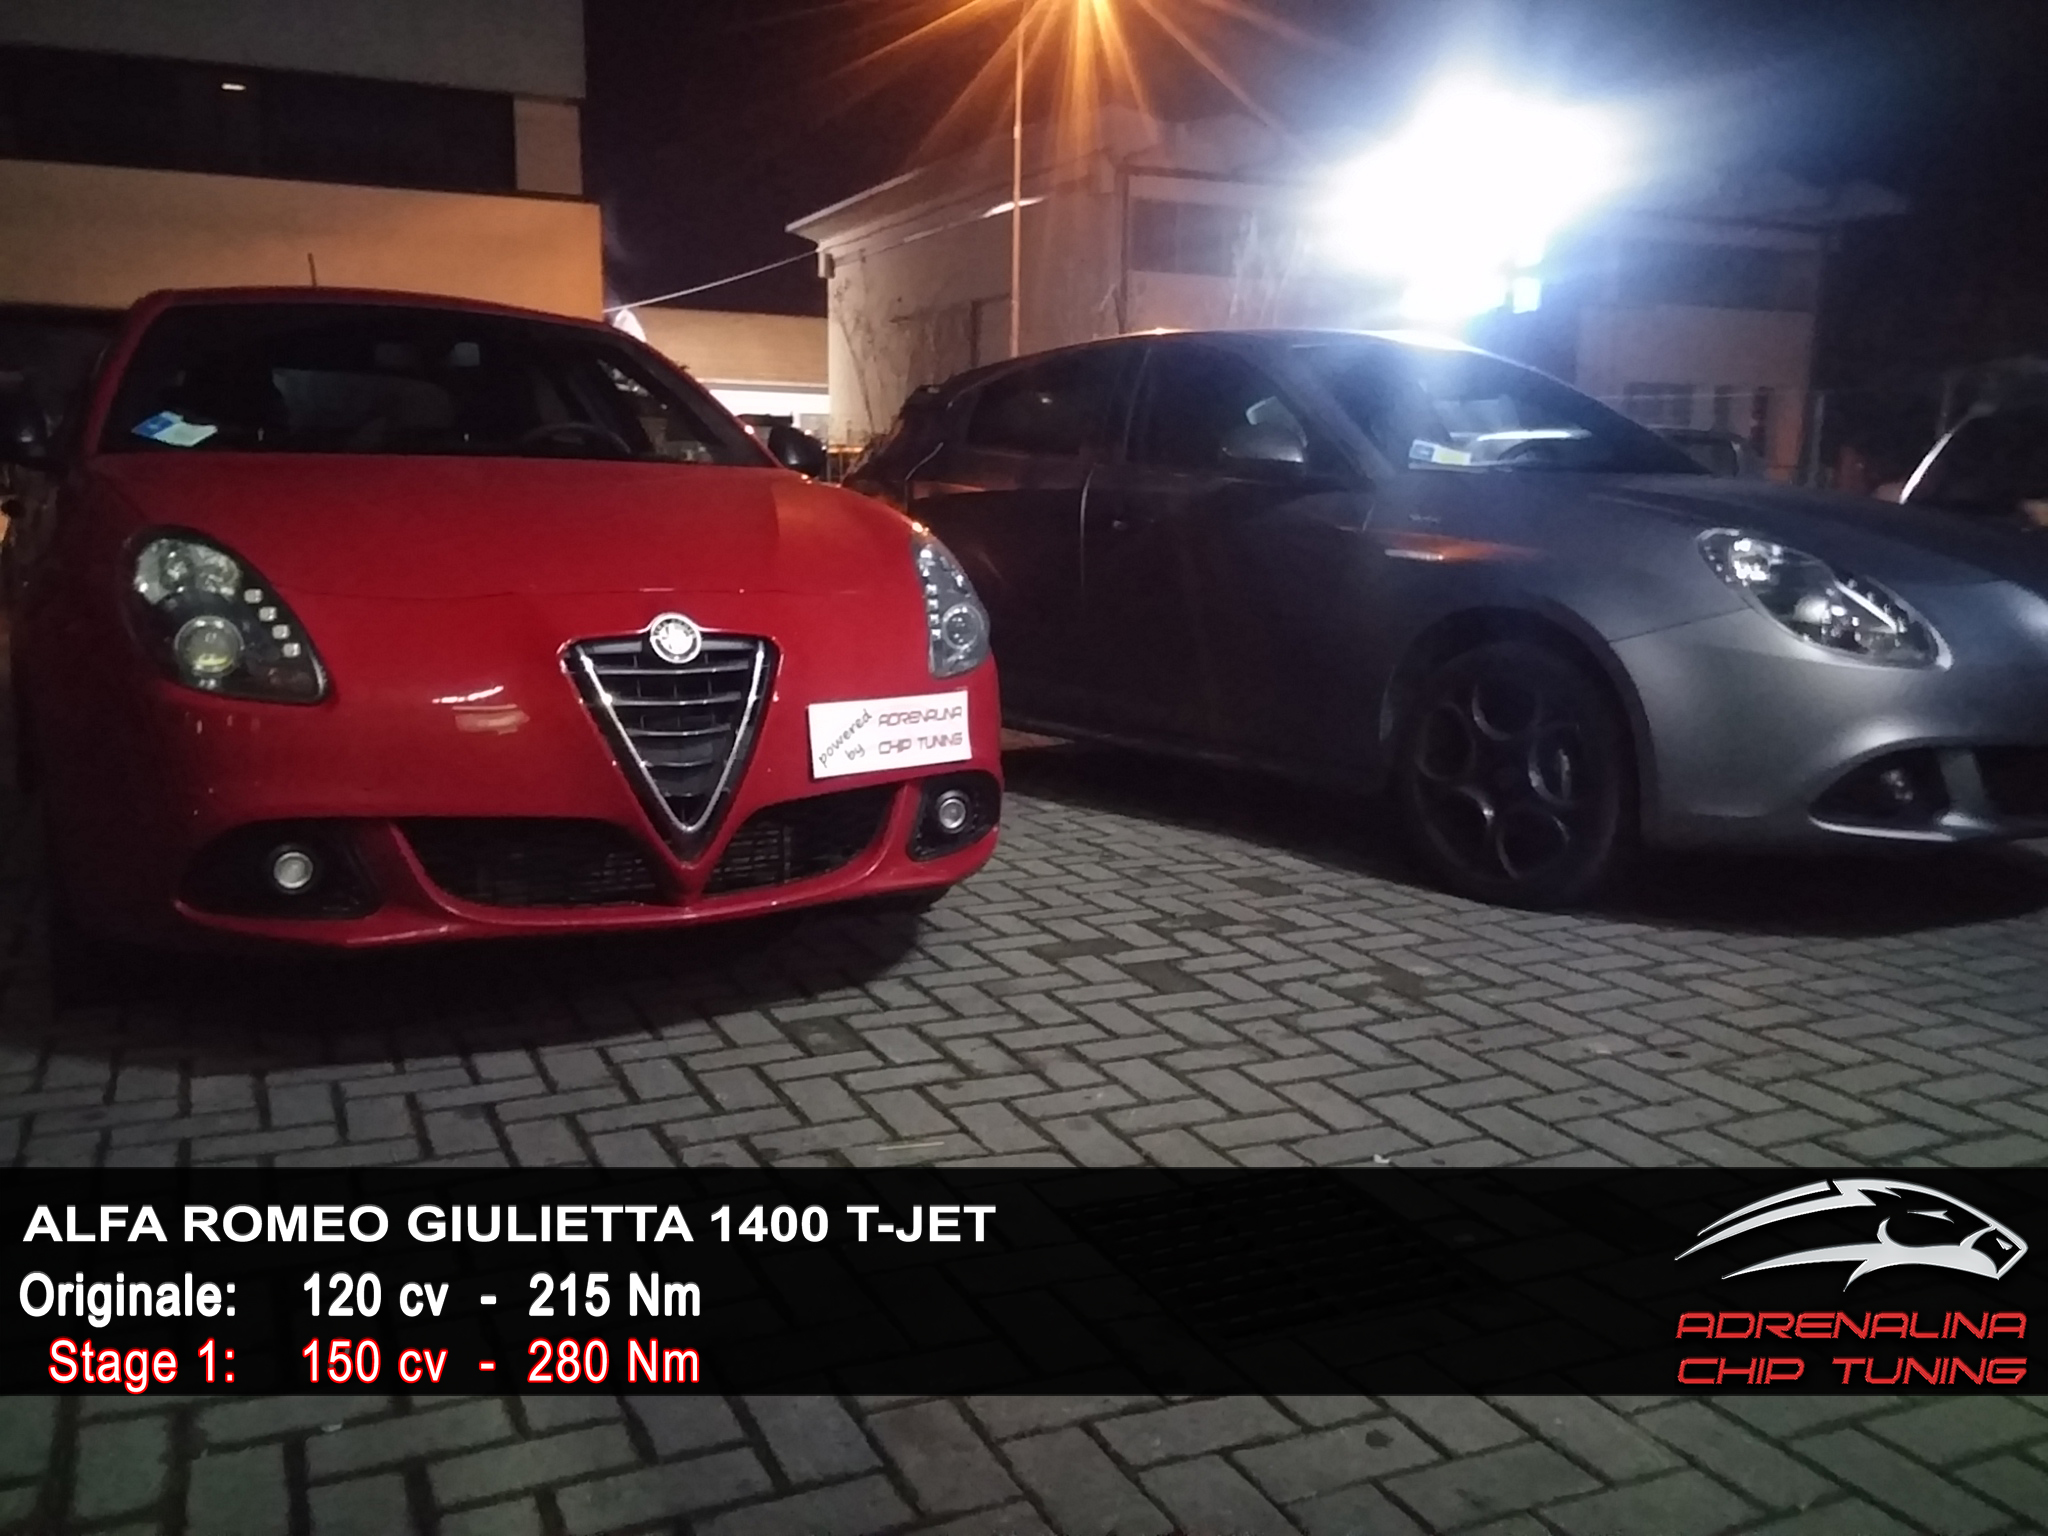 Alfa Romeo Giulietta 1400 TJET 120 GPL  2015  Adrenalina Chip Tuning